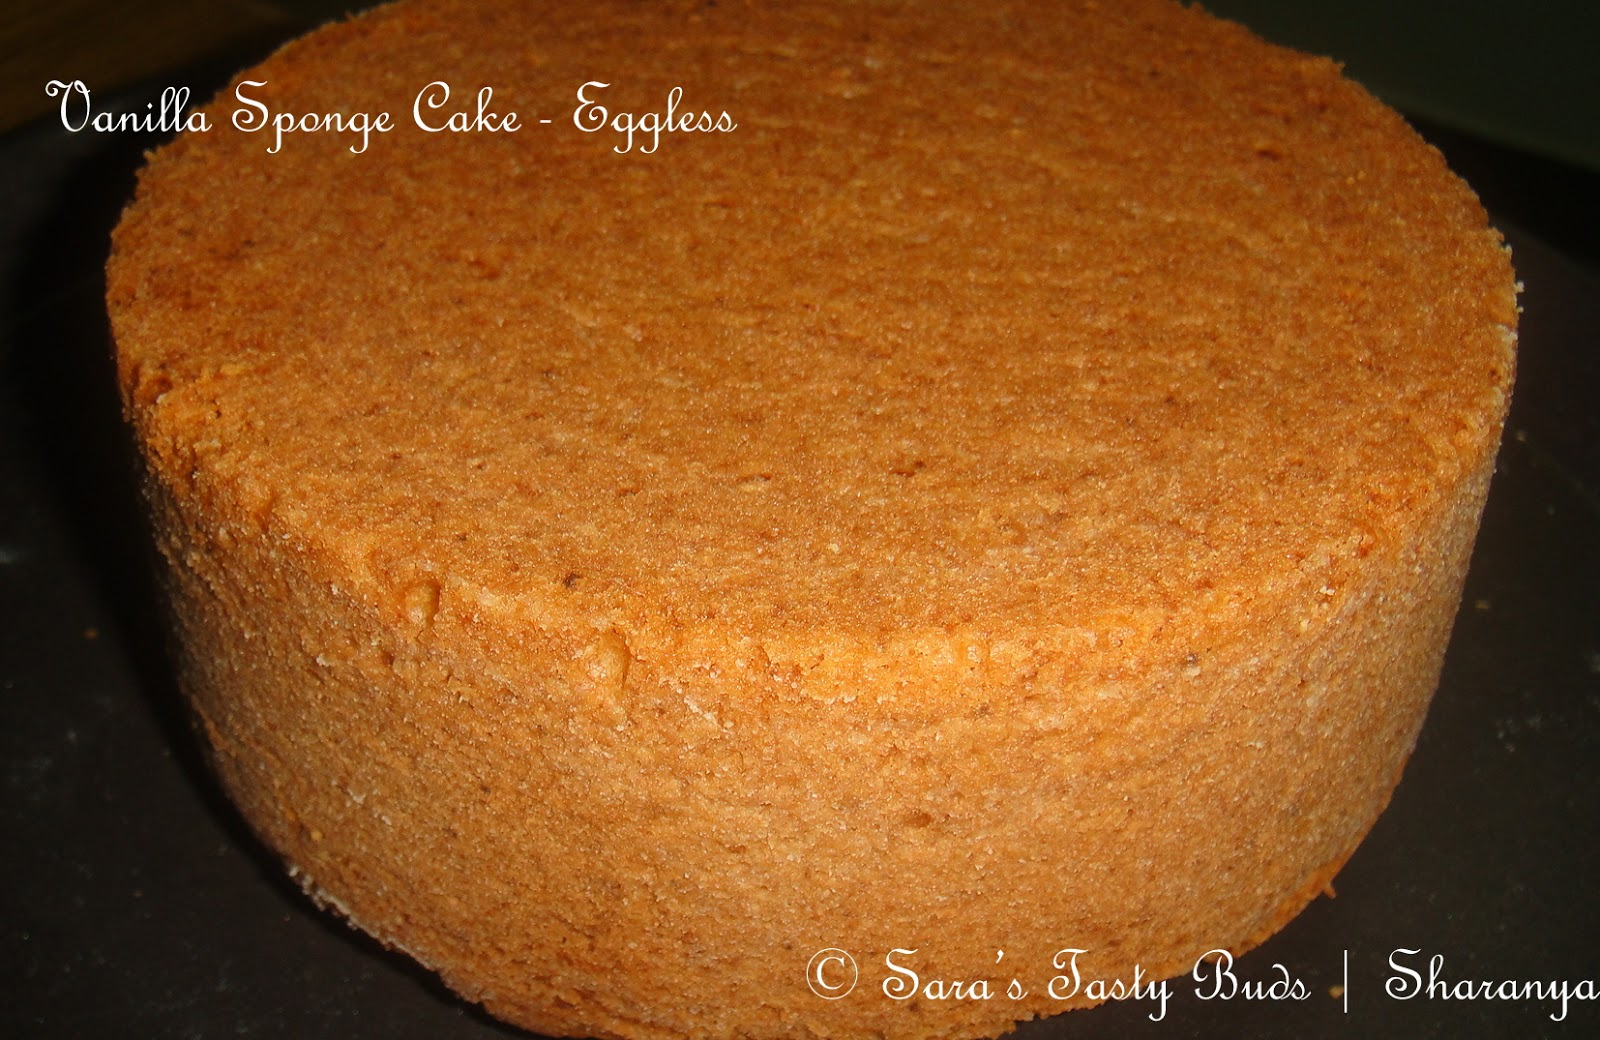 SARA S TASTY BUDS: Eggless Vanilla Sponge Cake